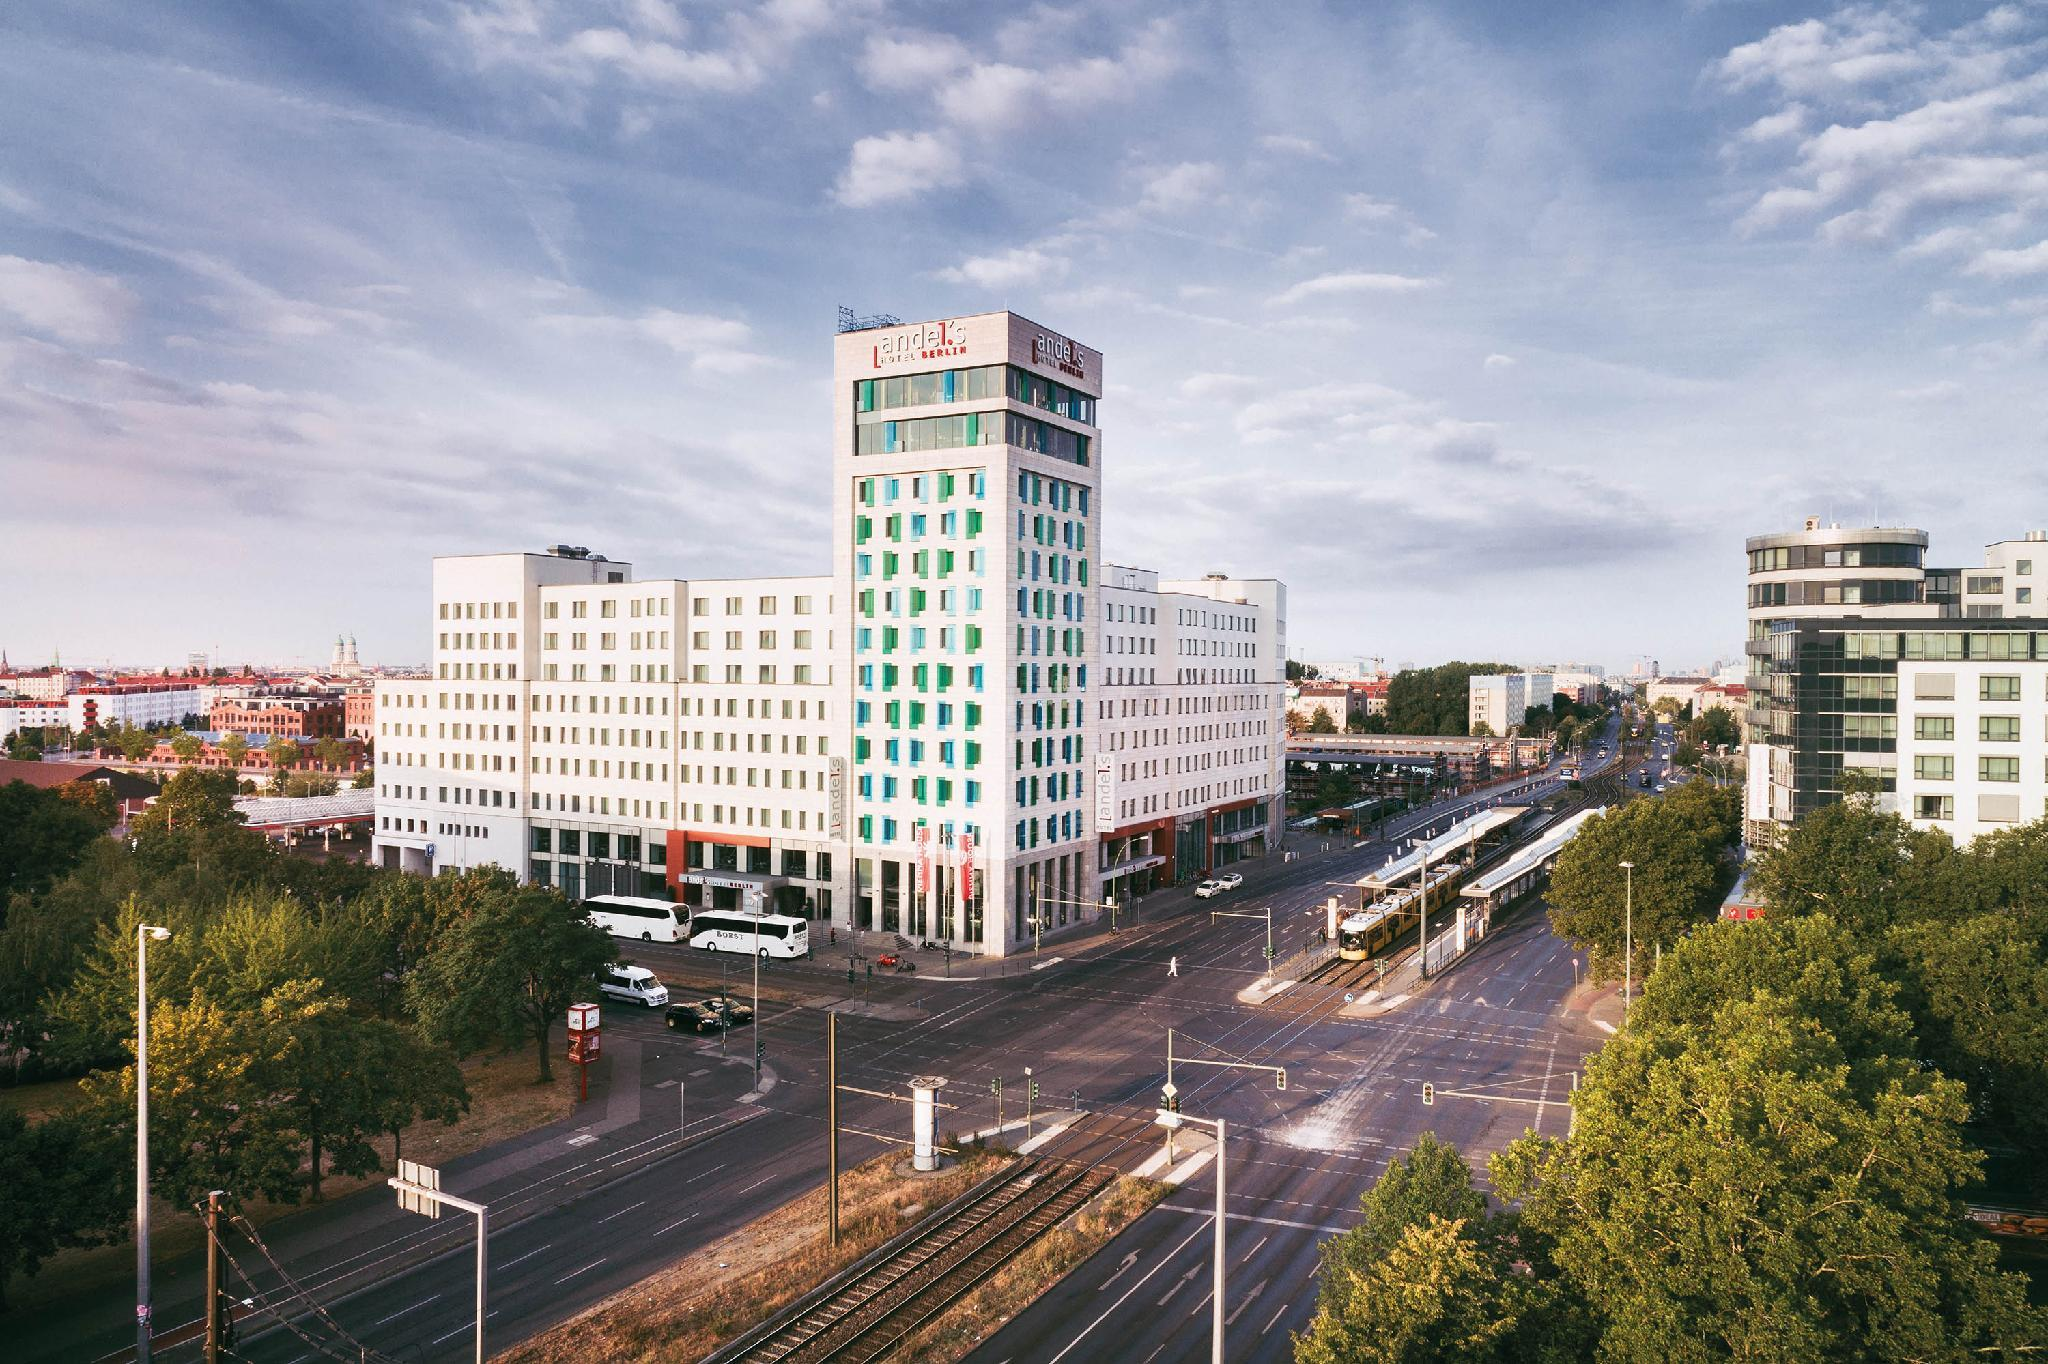 Vienna House Andel�s Berlin